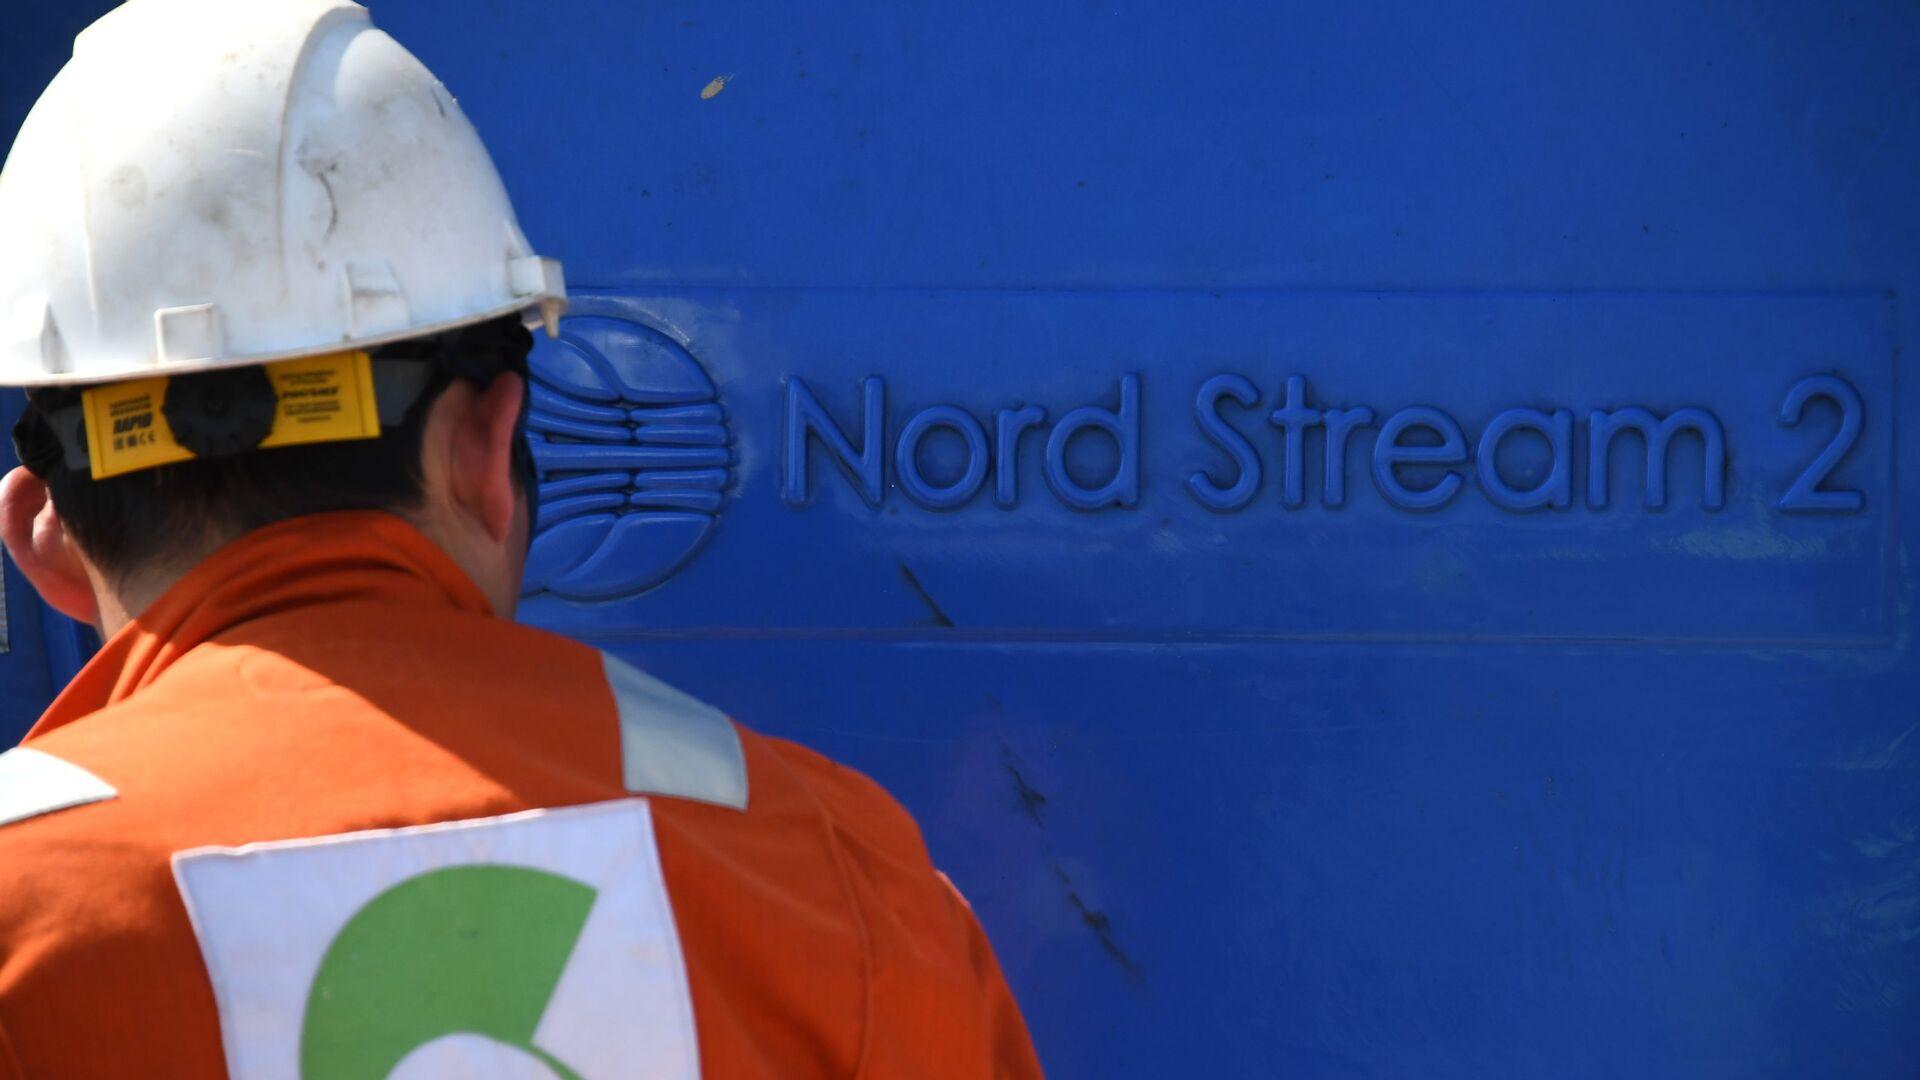 Budowa Nord Stream 2 - Sputnik Polska, 1920, 07.02.2021